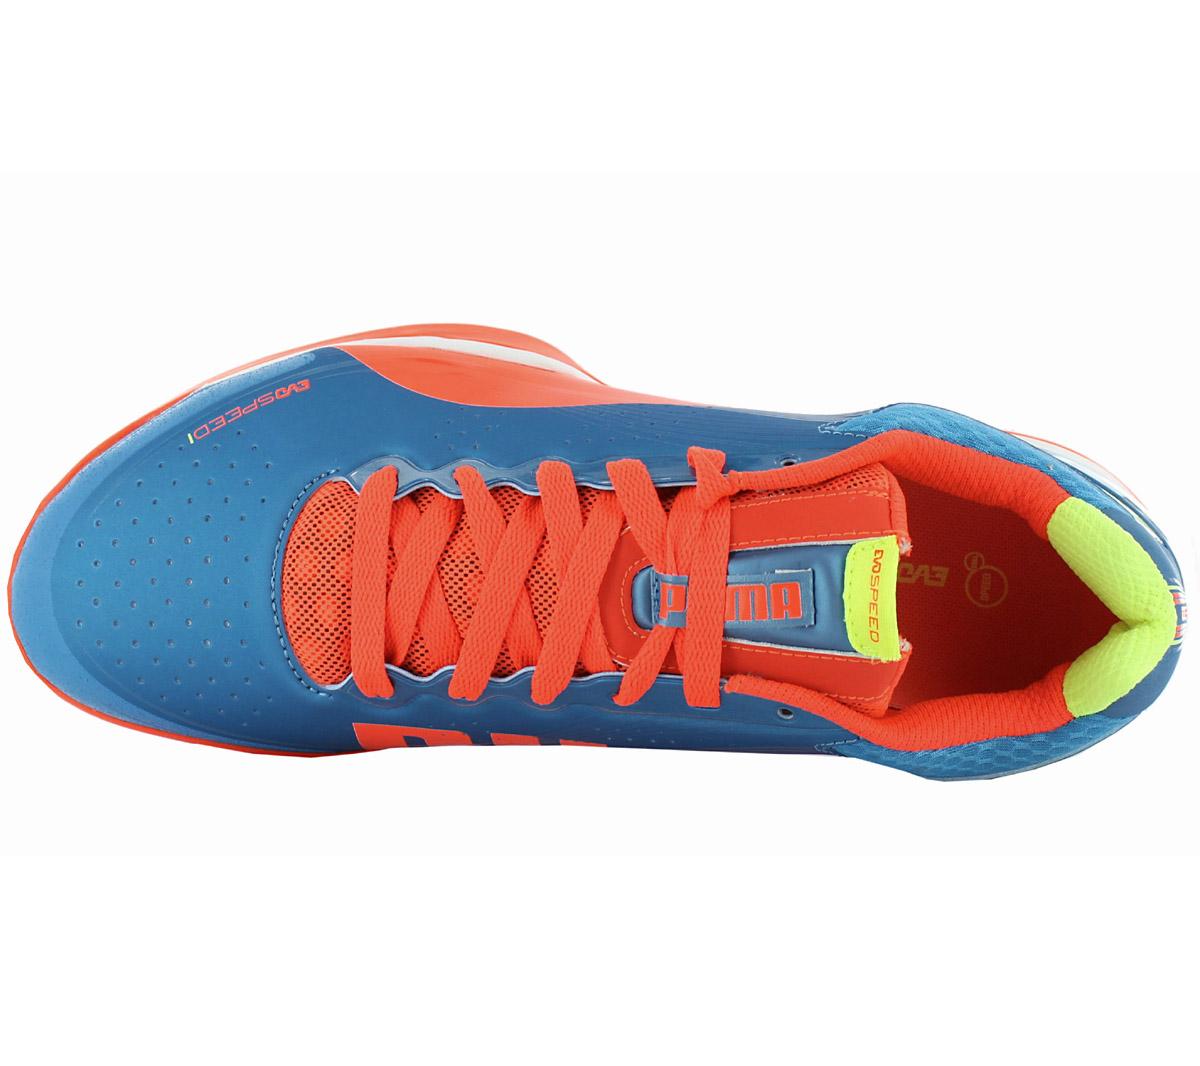 fcac51ebc Puma Evospeed Indoor 1.2 Men s Handball Squash 102850-03 New